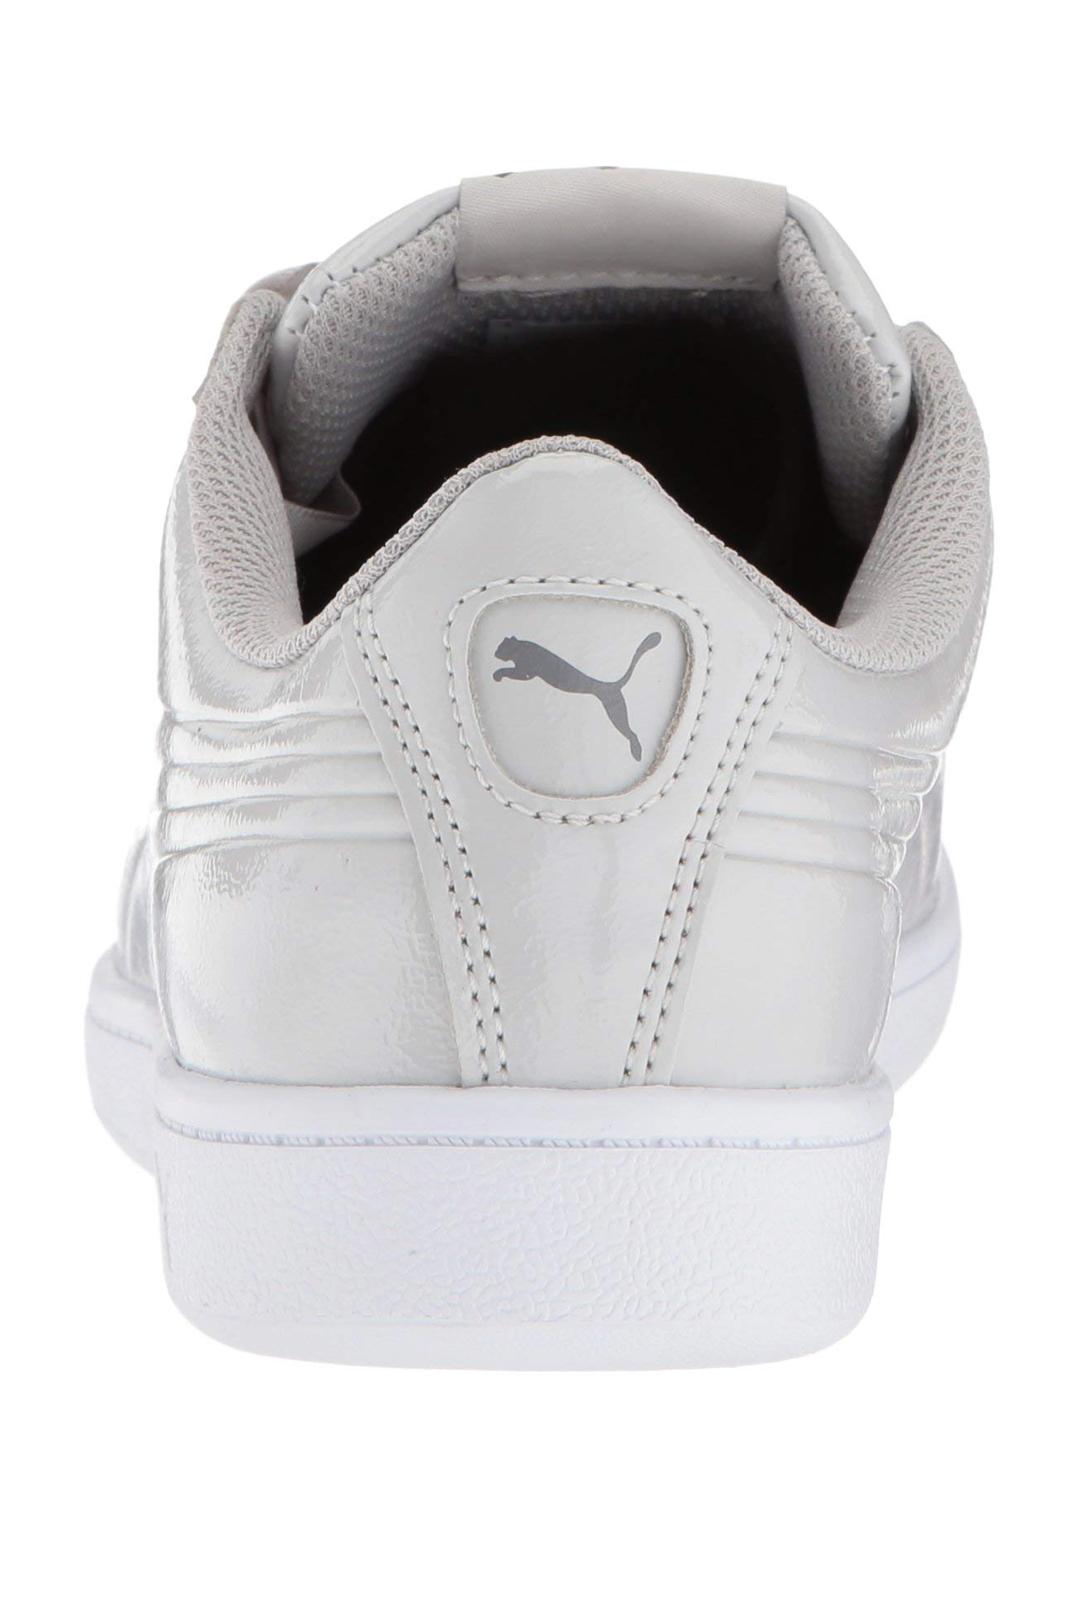 Baskets / Sneakers  Puma 366417 02 BLANC